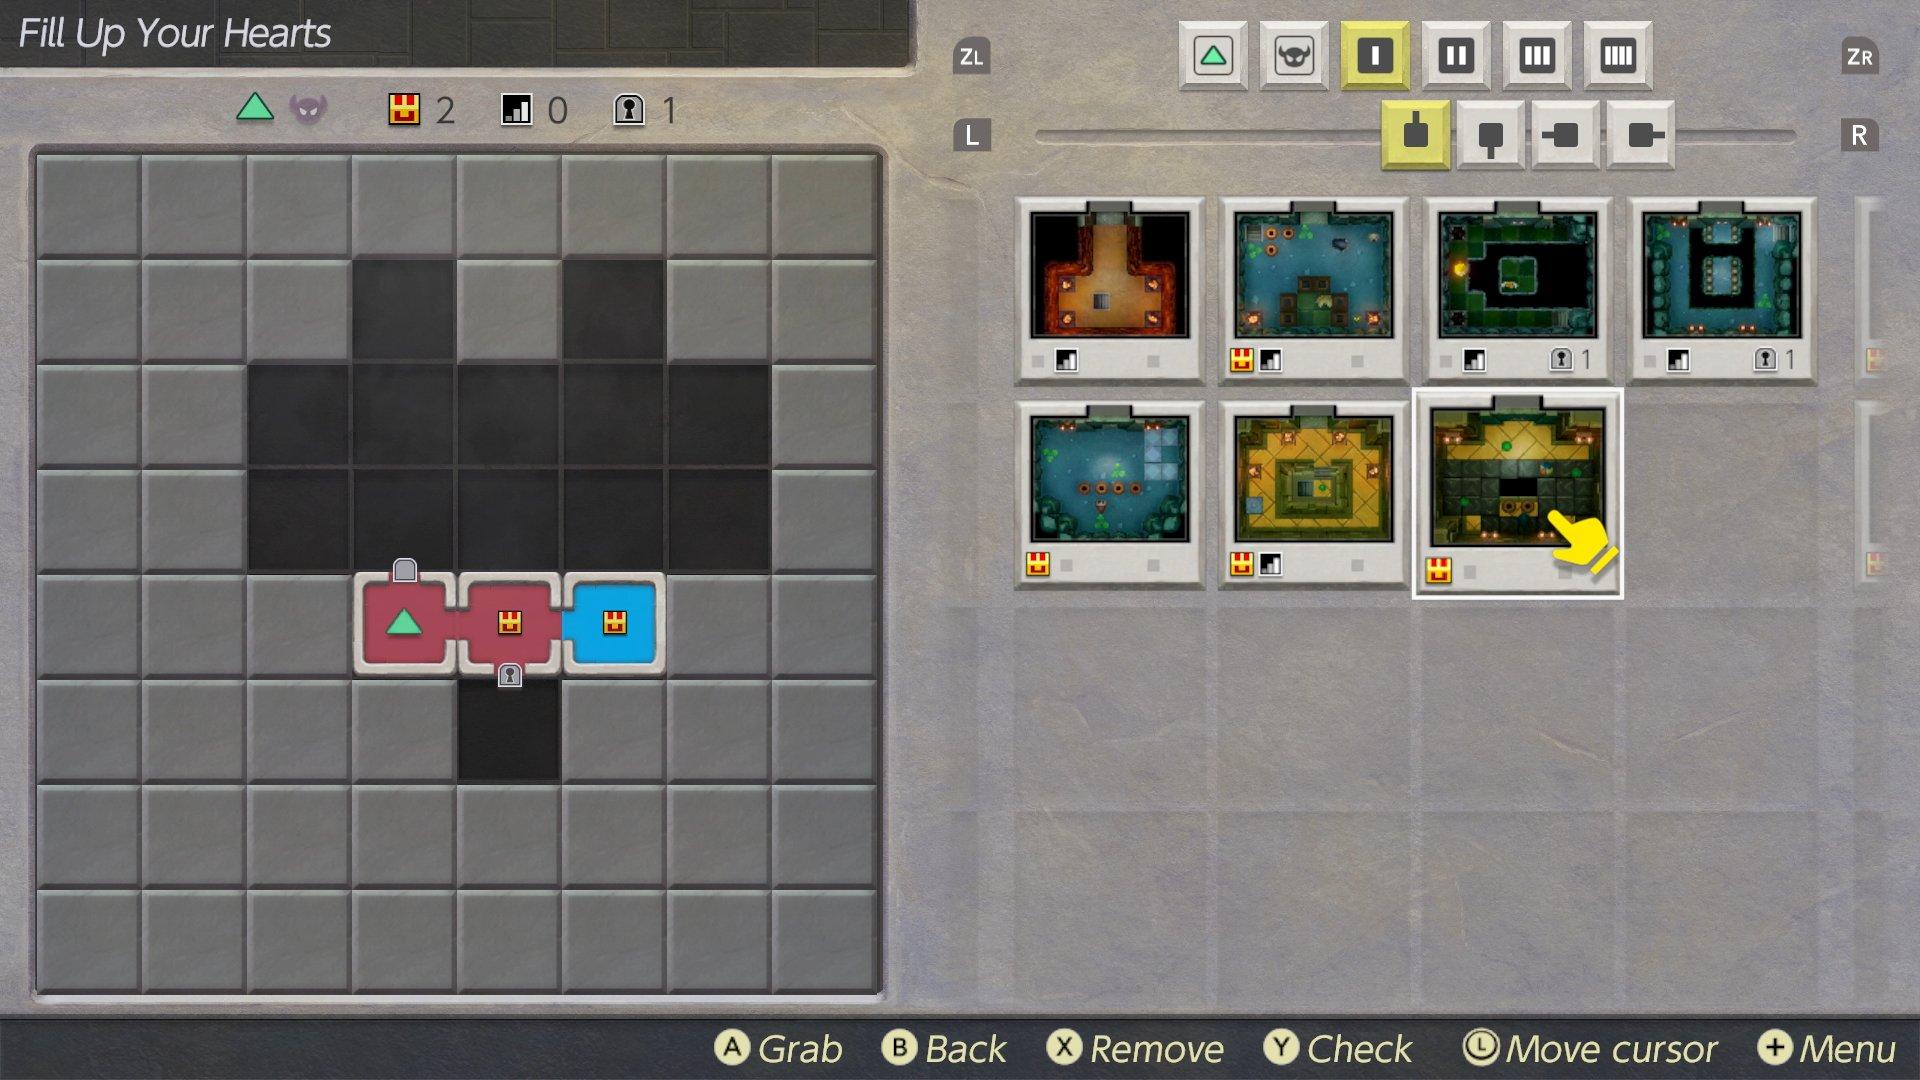 NSwitch_TheLegendofZeldaLinksAwakening_Dungeons_05.jpg